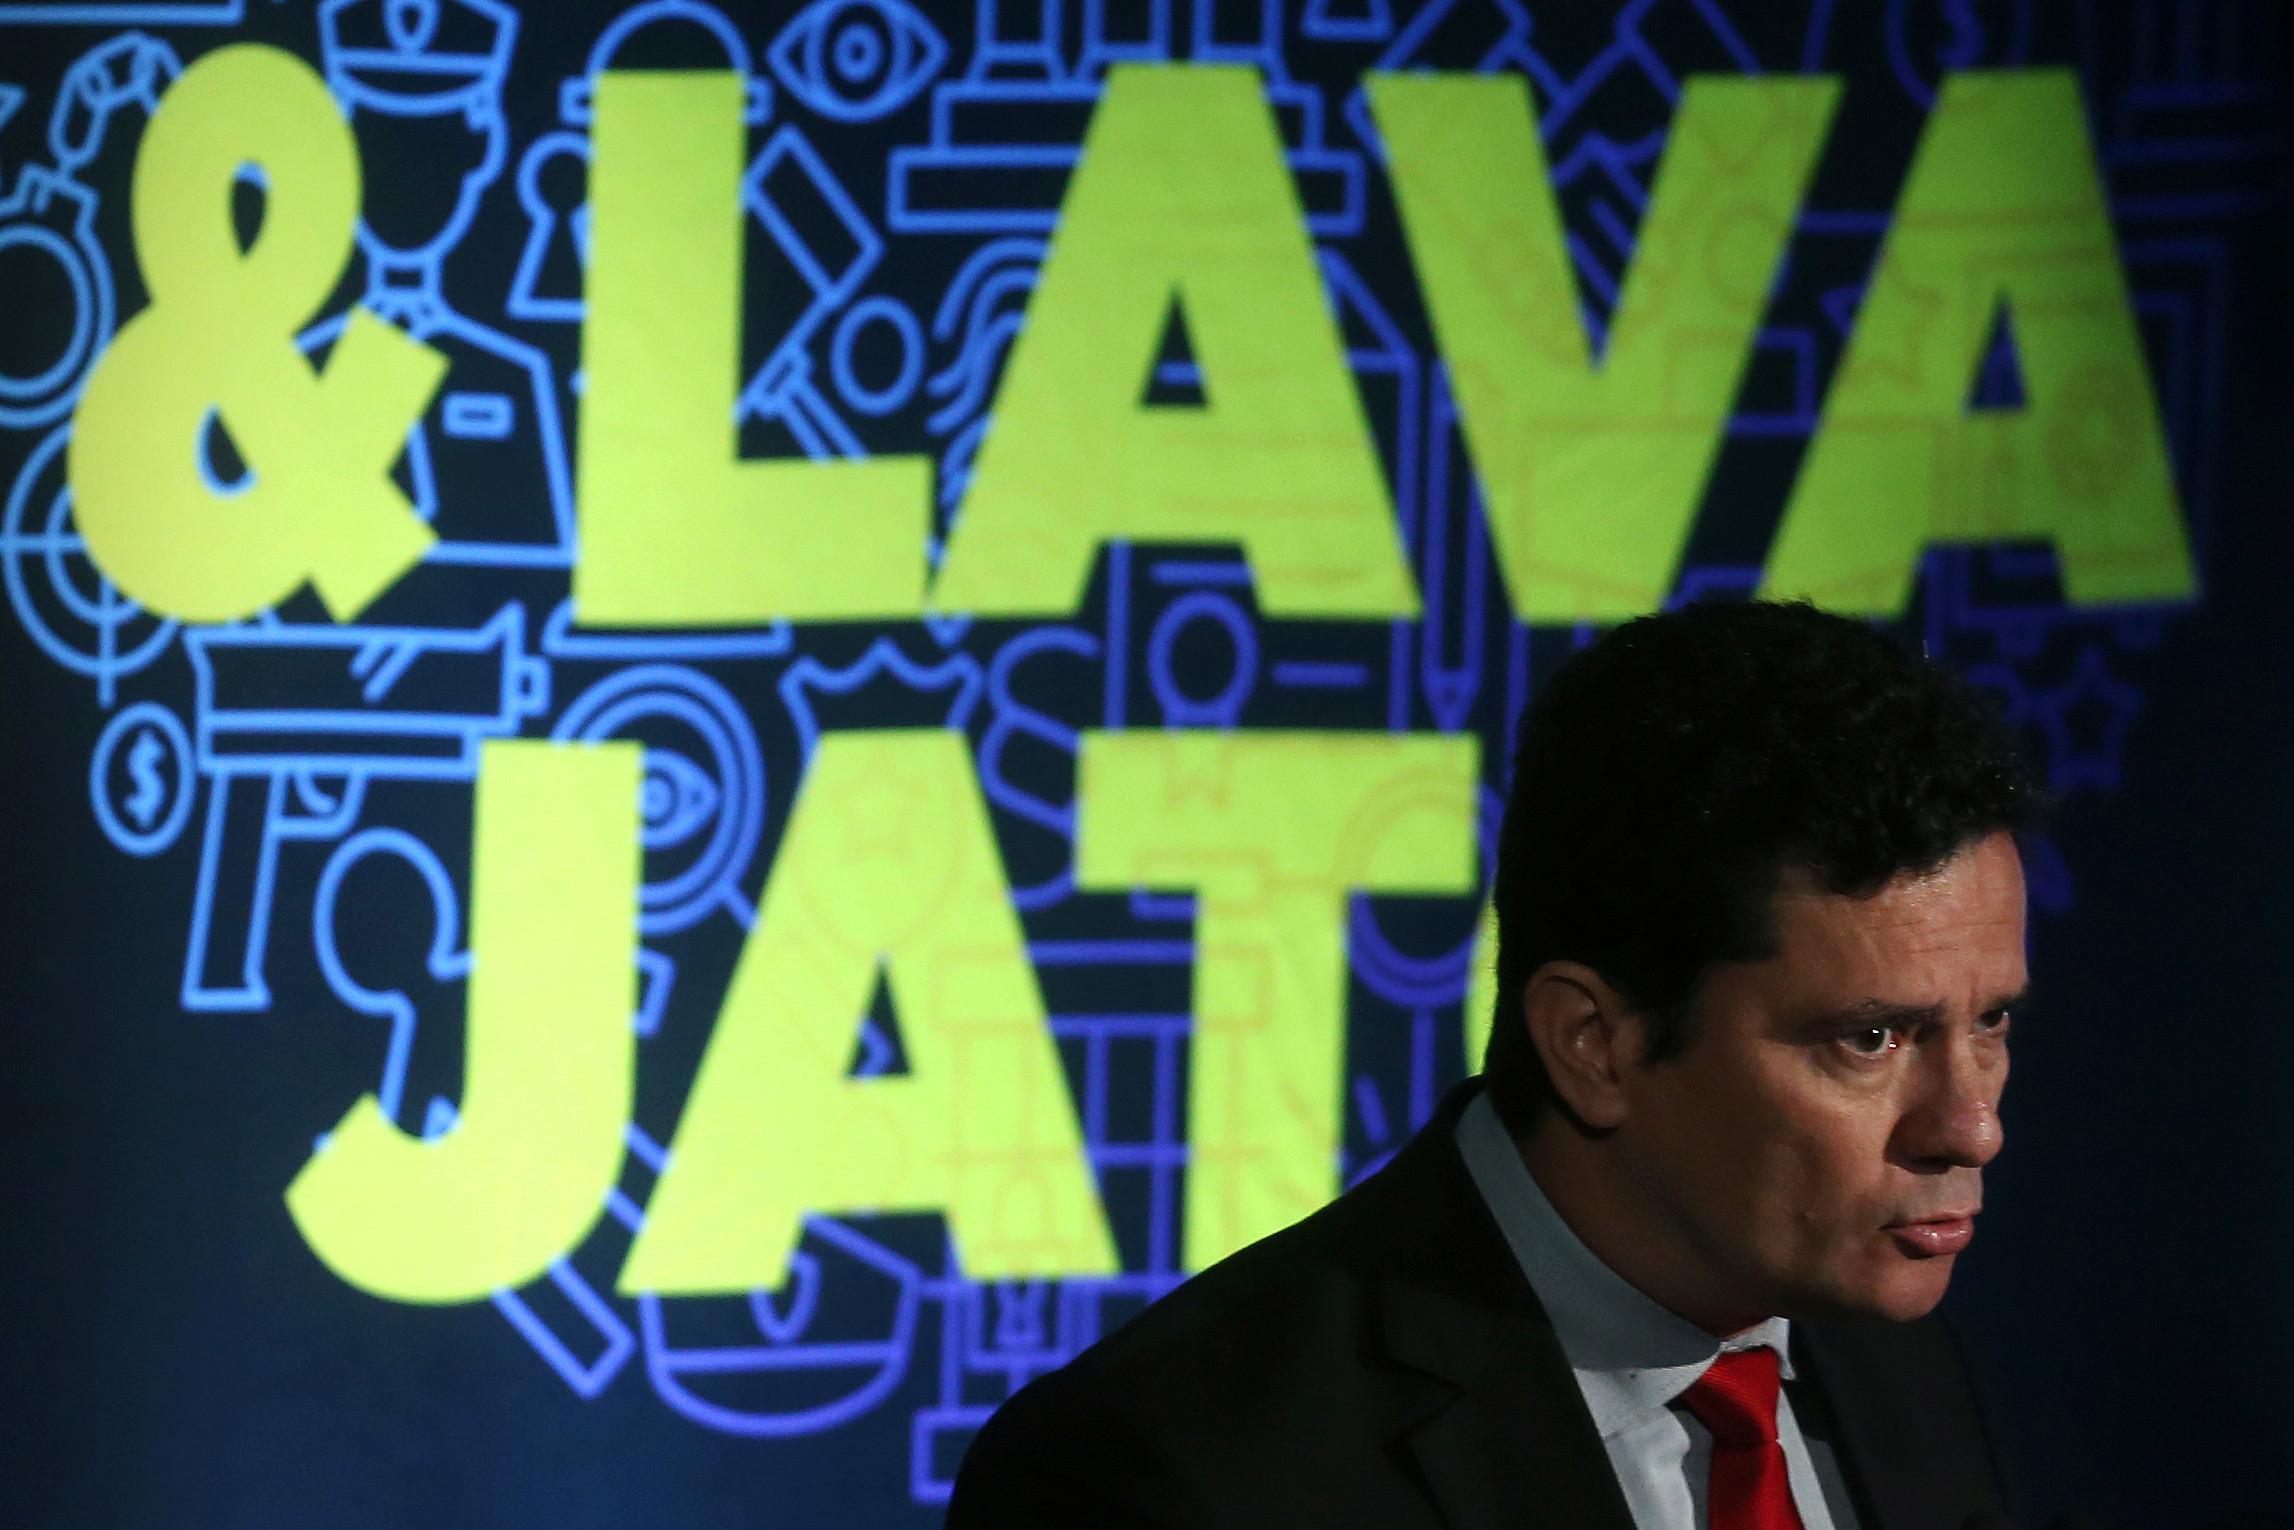 Juiz do processo Lava Jato aceita ser ministro da Justiça de Bolsonaro